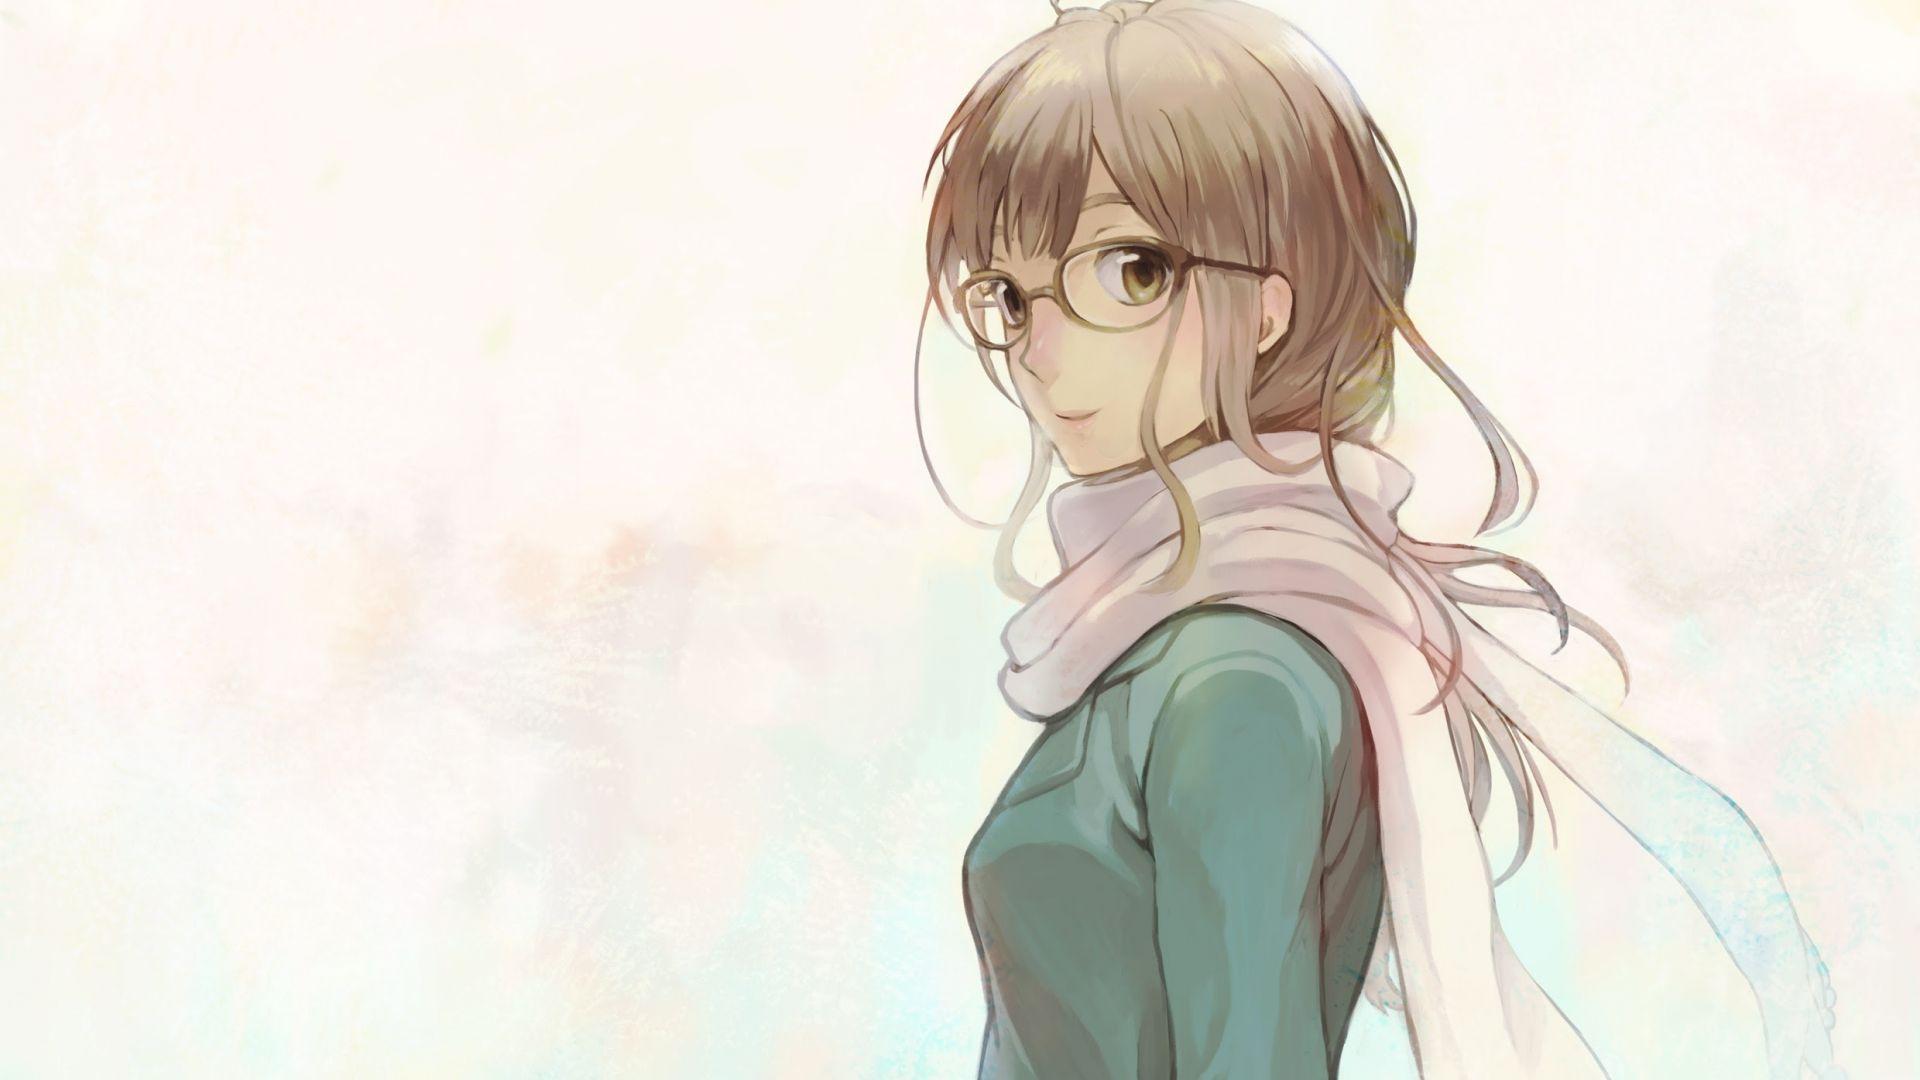 Desktop Wallpaper Cute Anime Girl Glasses Blonde Art Hd Image